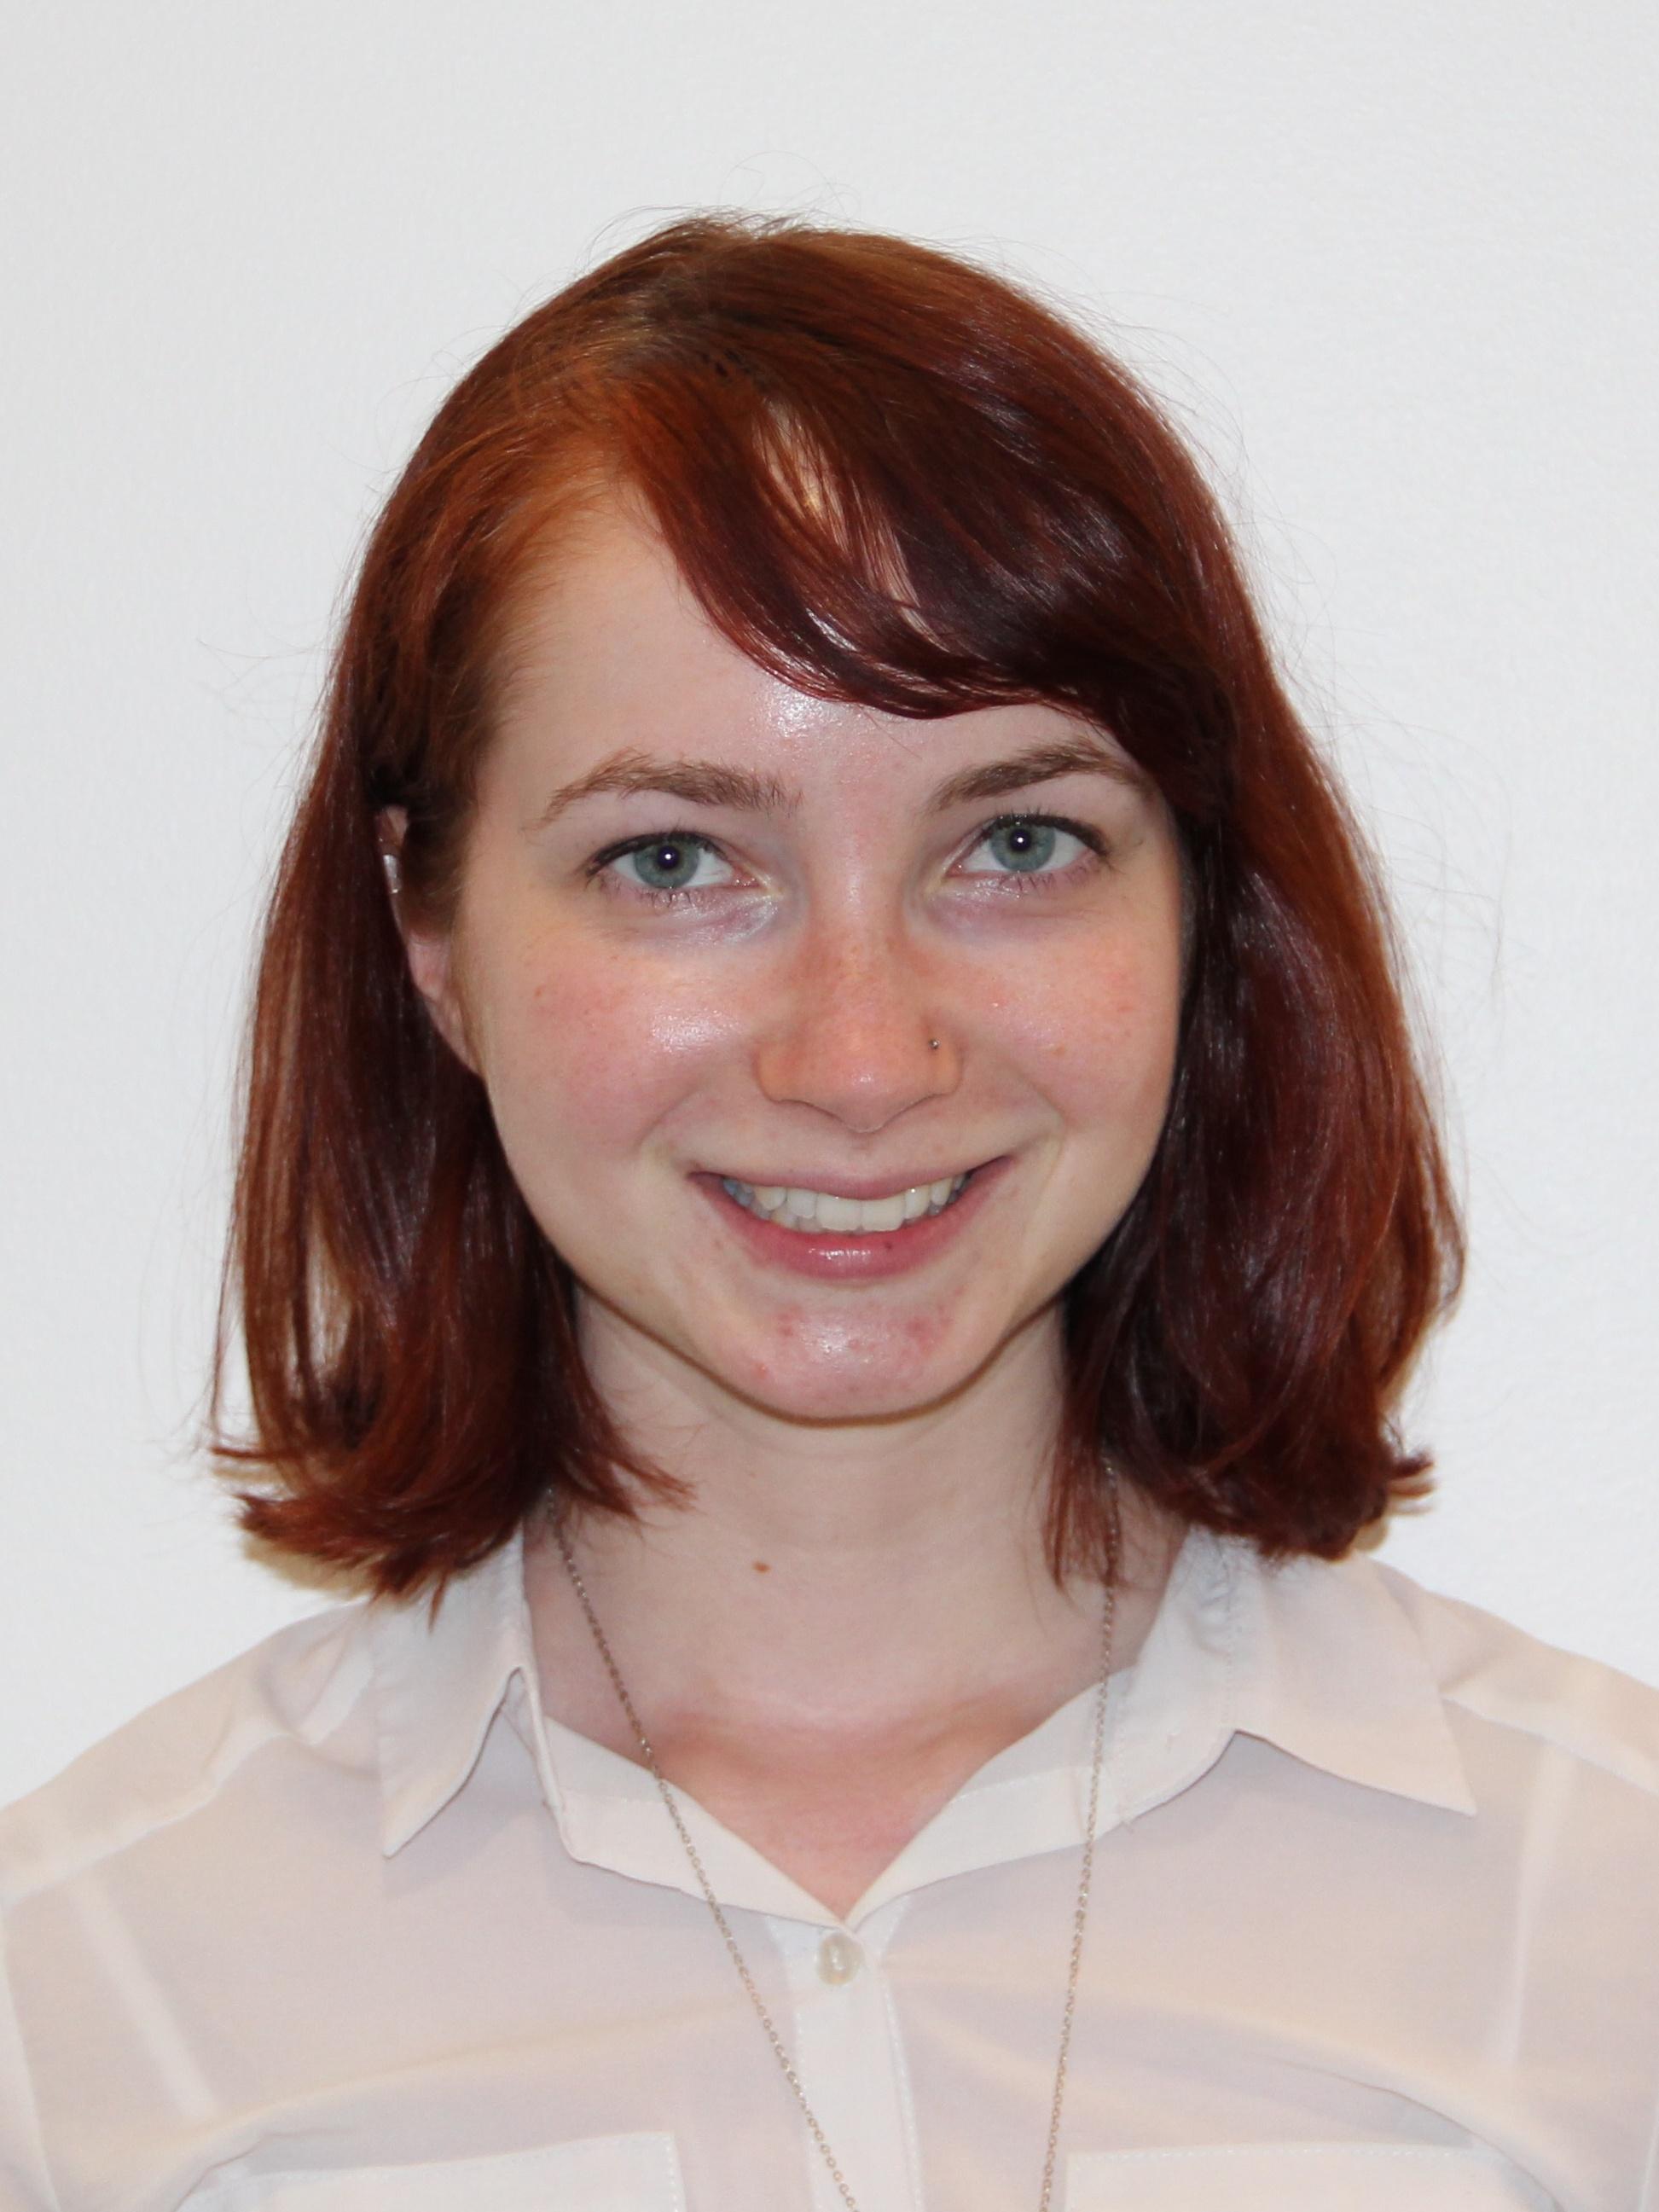 A headshot of Arielle Zimmerman